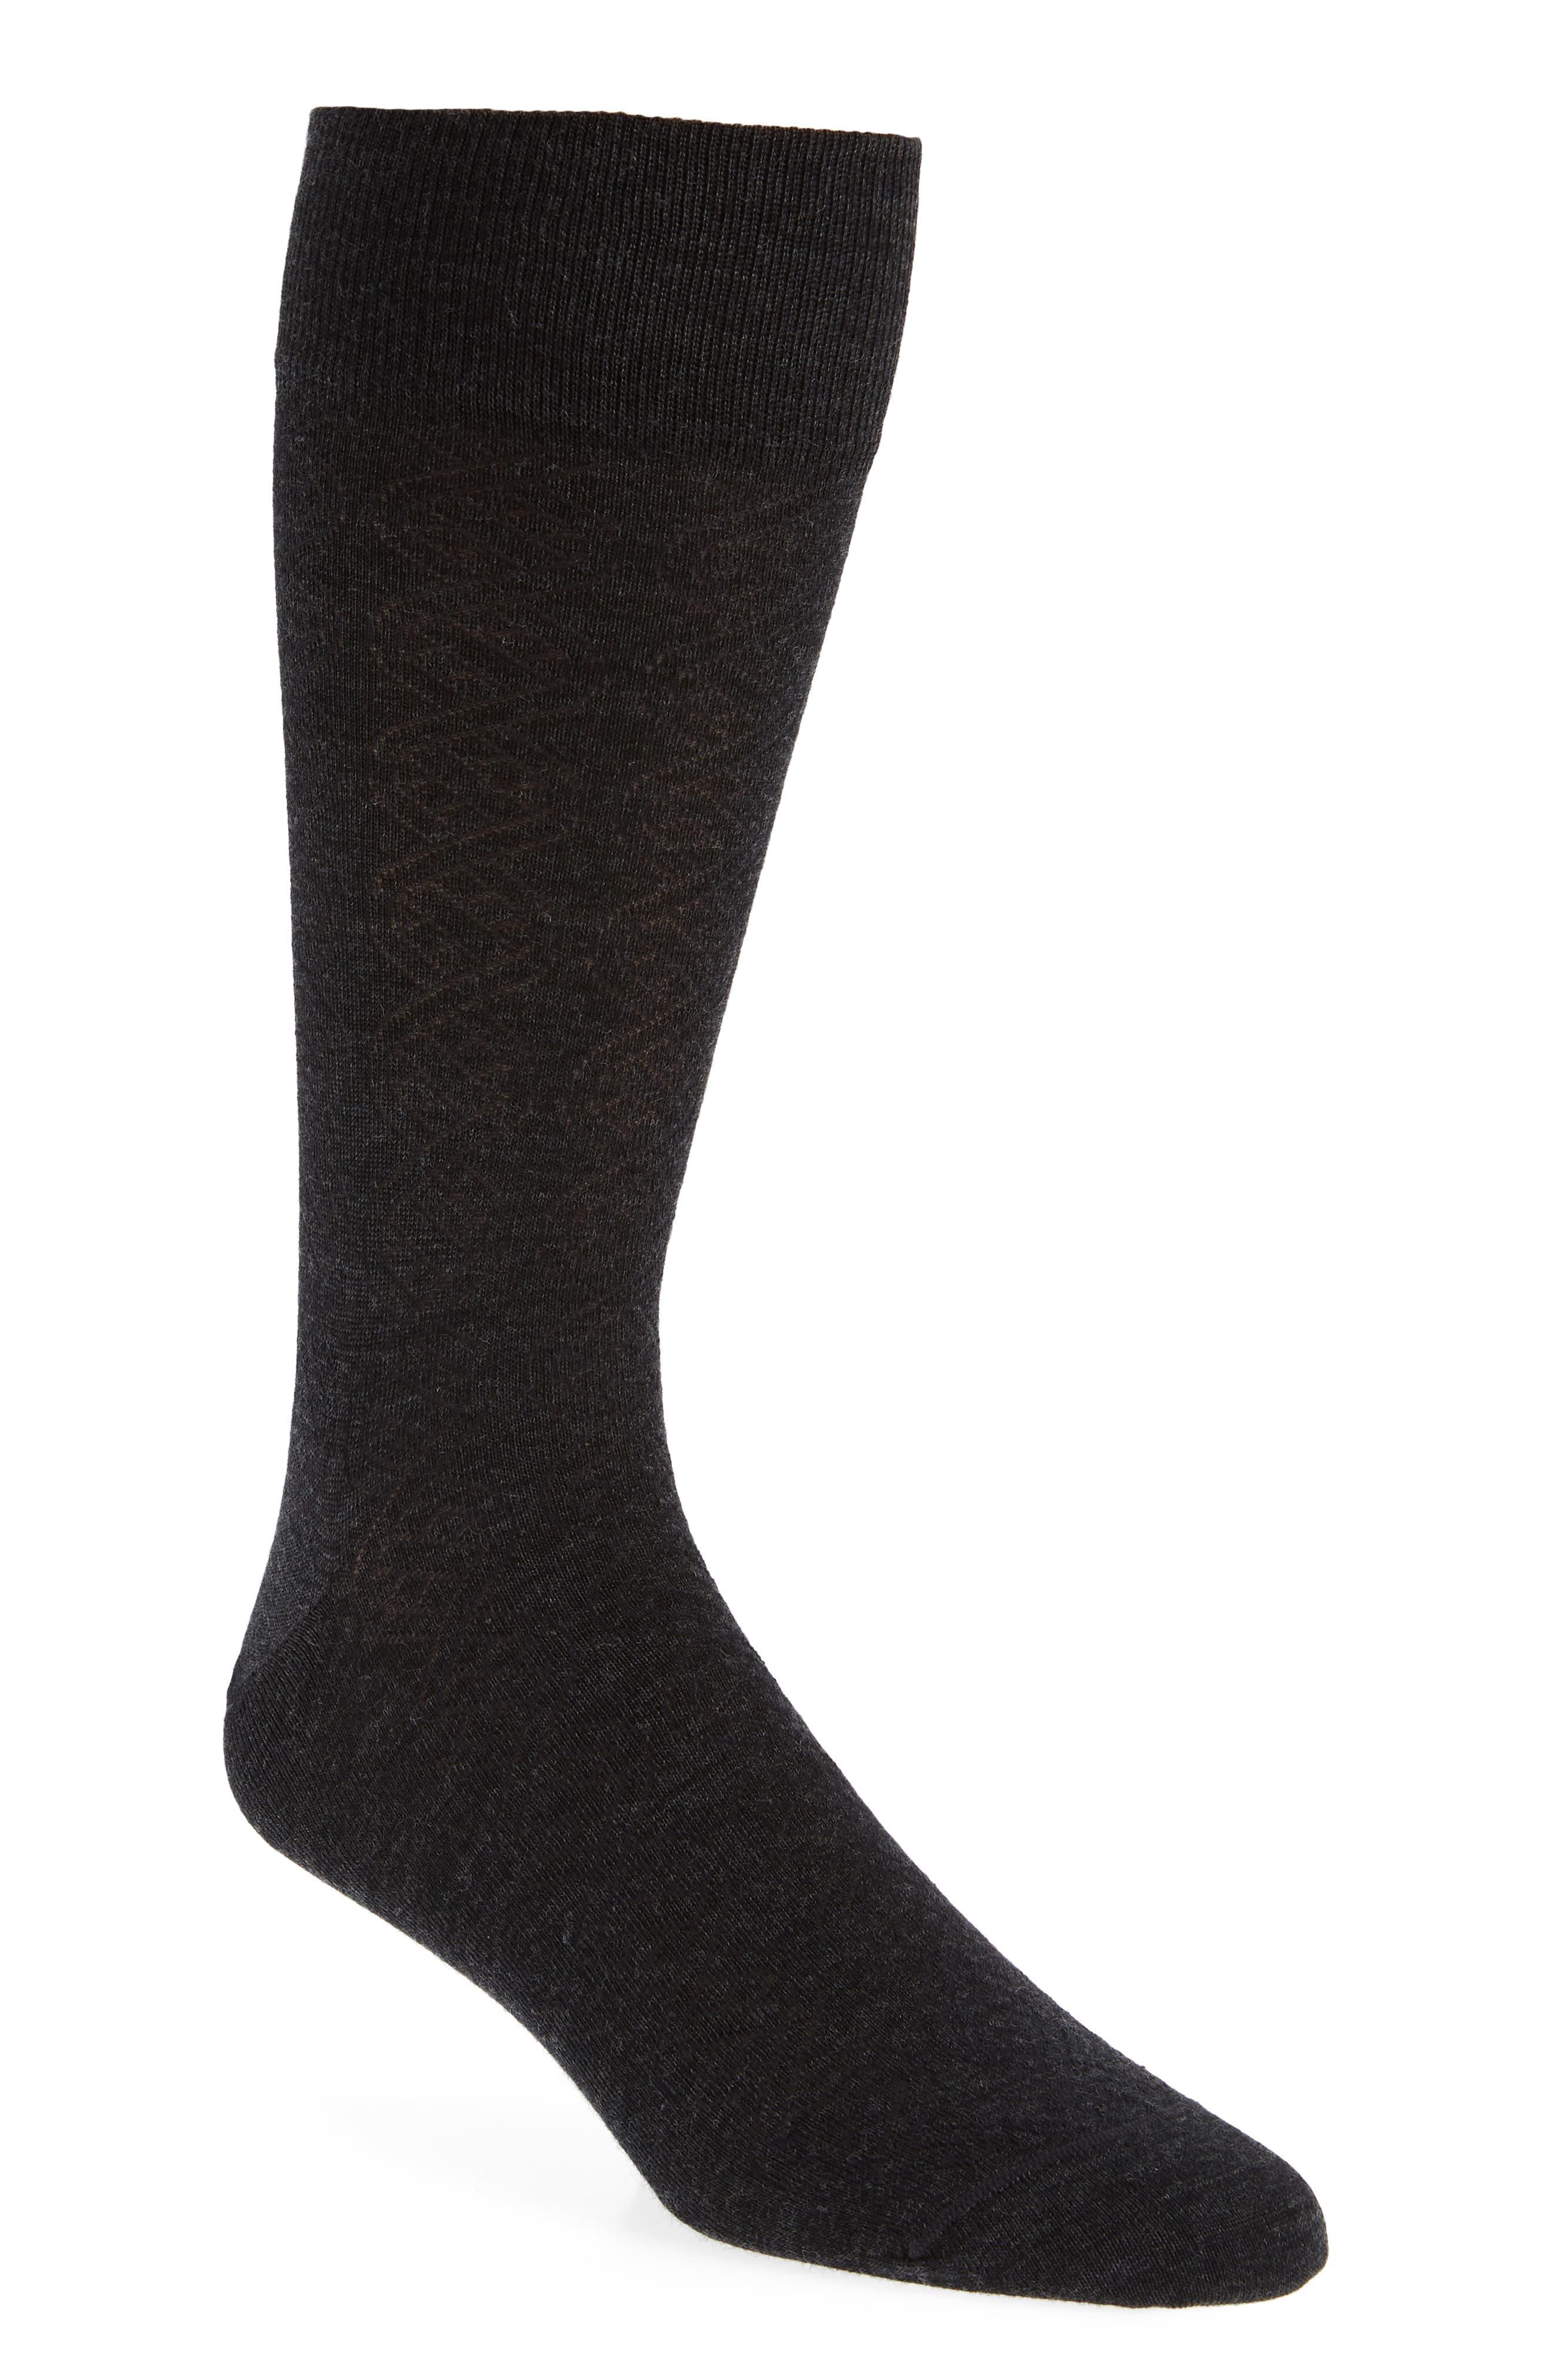 Cable Merino Wool Blend Socks, Main, color, 021